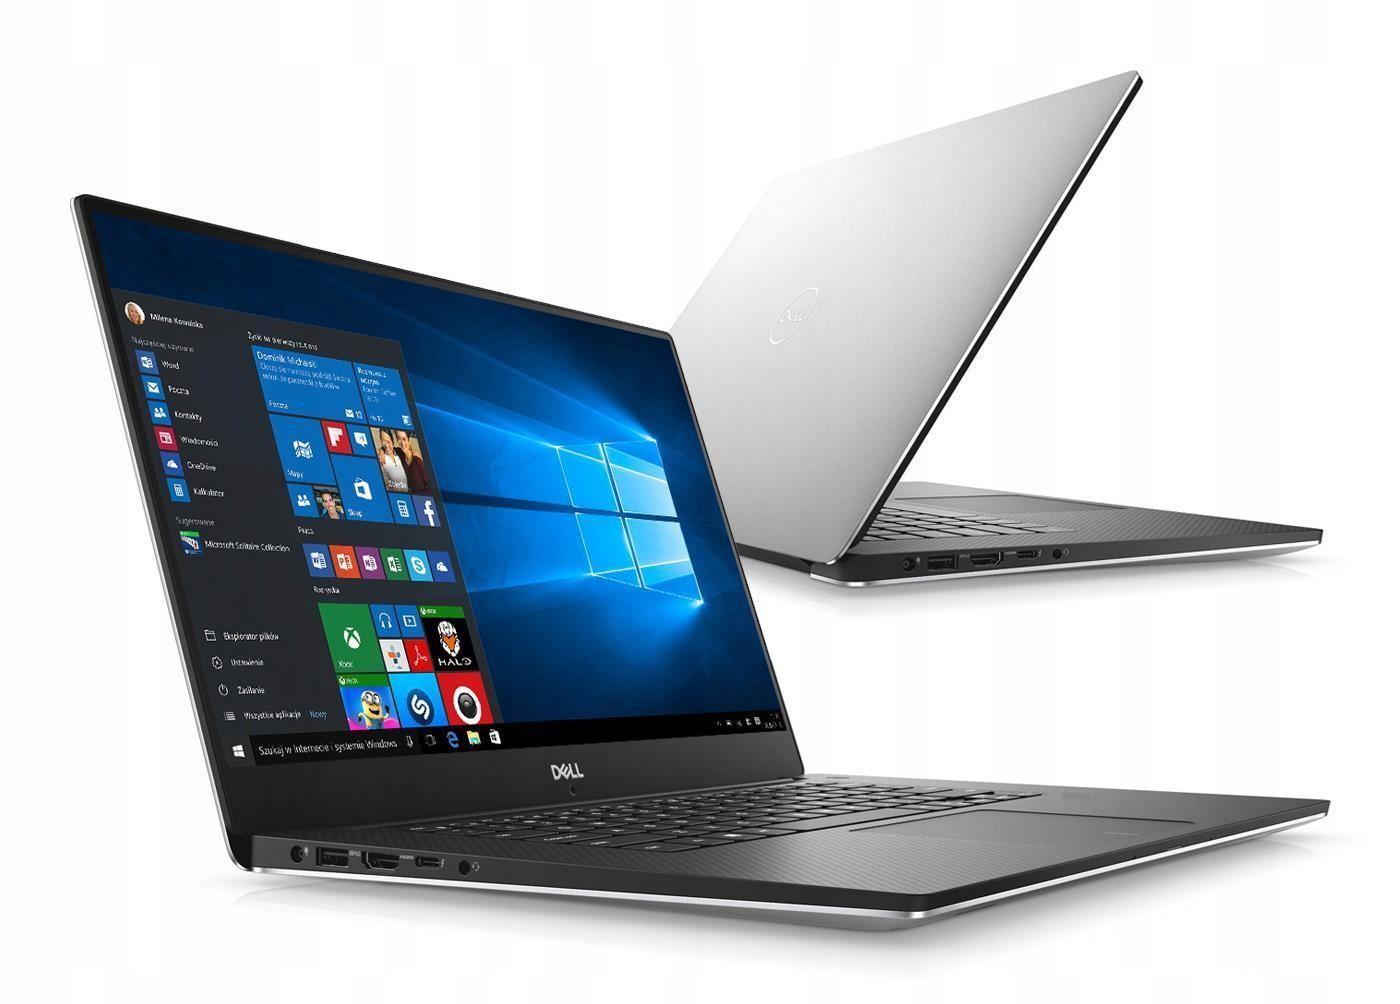 laptop-giam-gia-tuan-nay-msi-dell-va-asus-tung-hang-voi-nhieu-lua-chon-cho-nguoi-dung-1